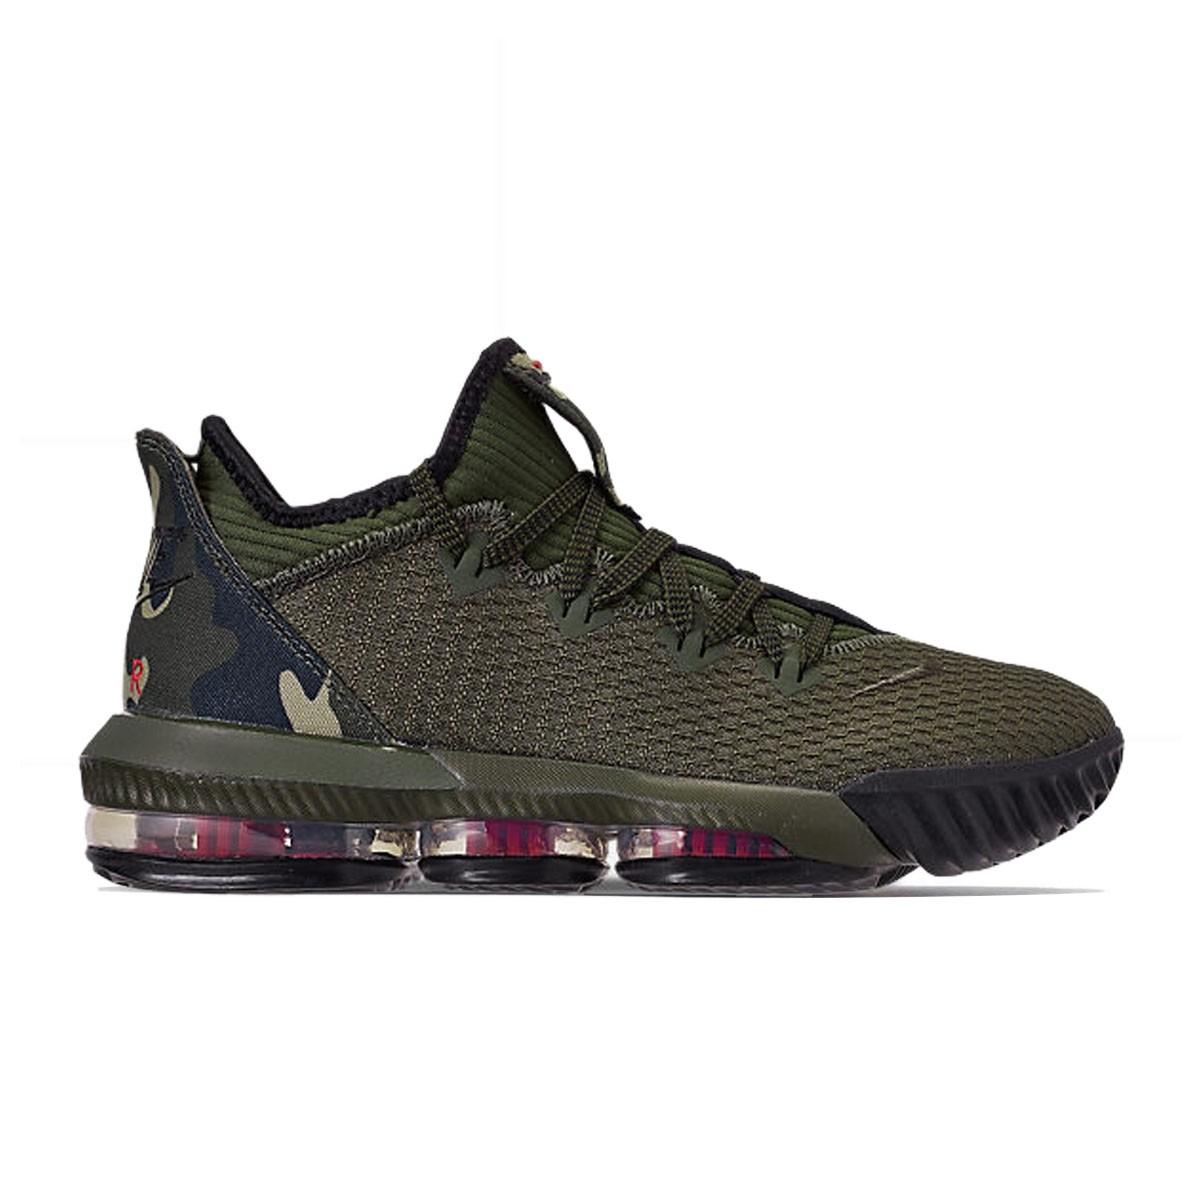 Nike Lebron XVI Low 'Camo'